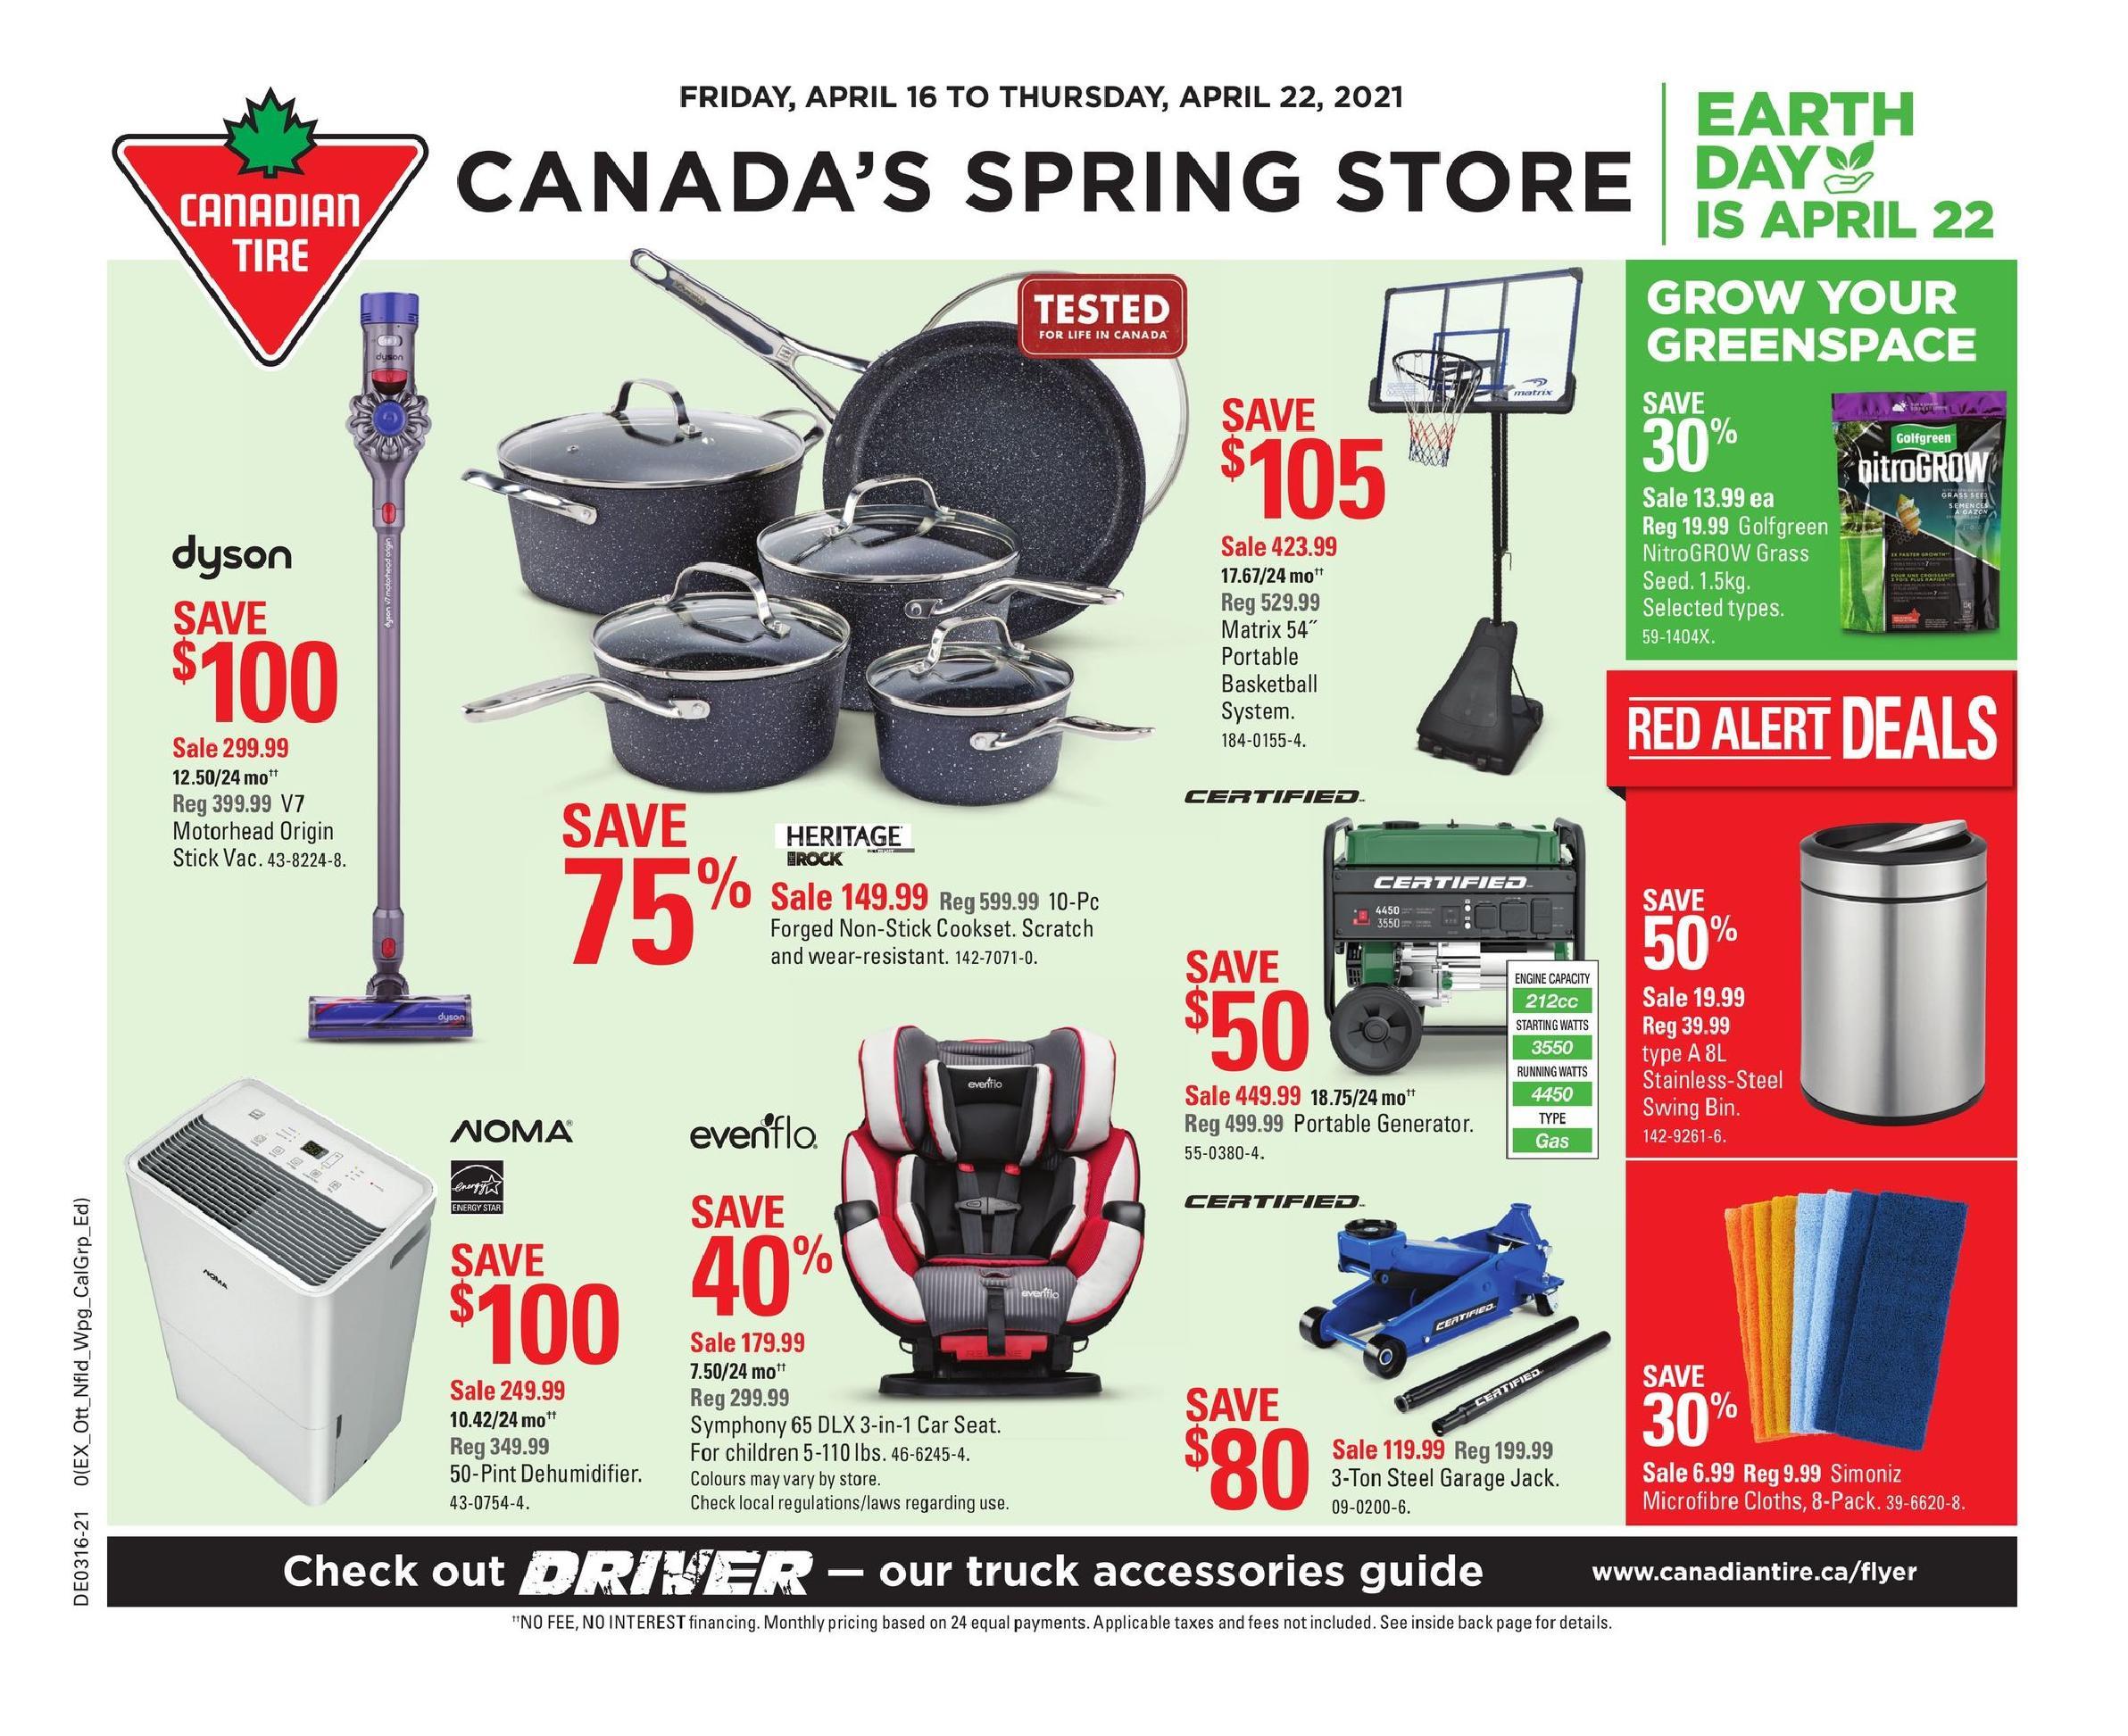 01 Canadian Tire Flyer April 16 April 22 2021